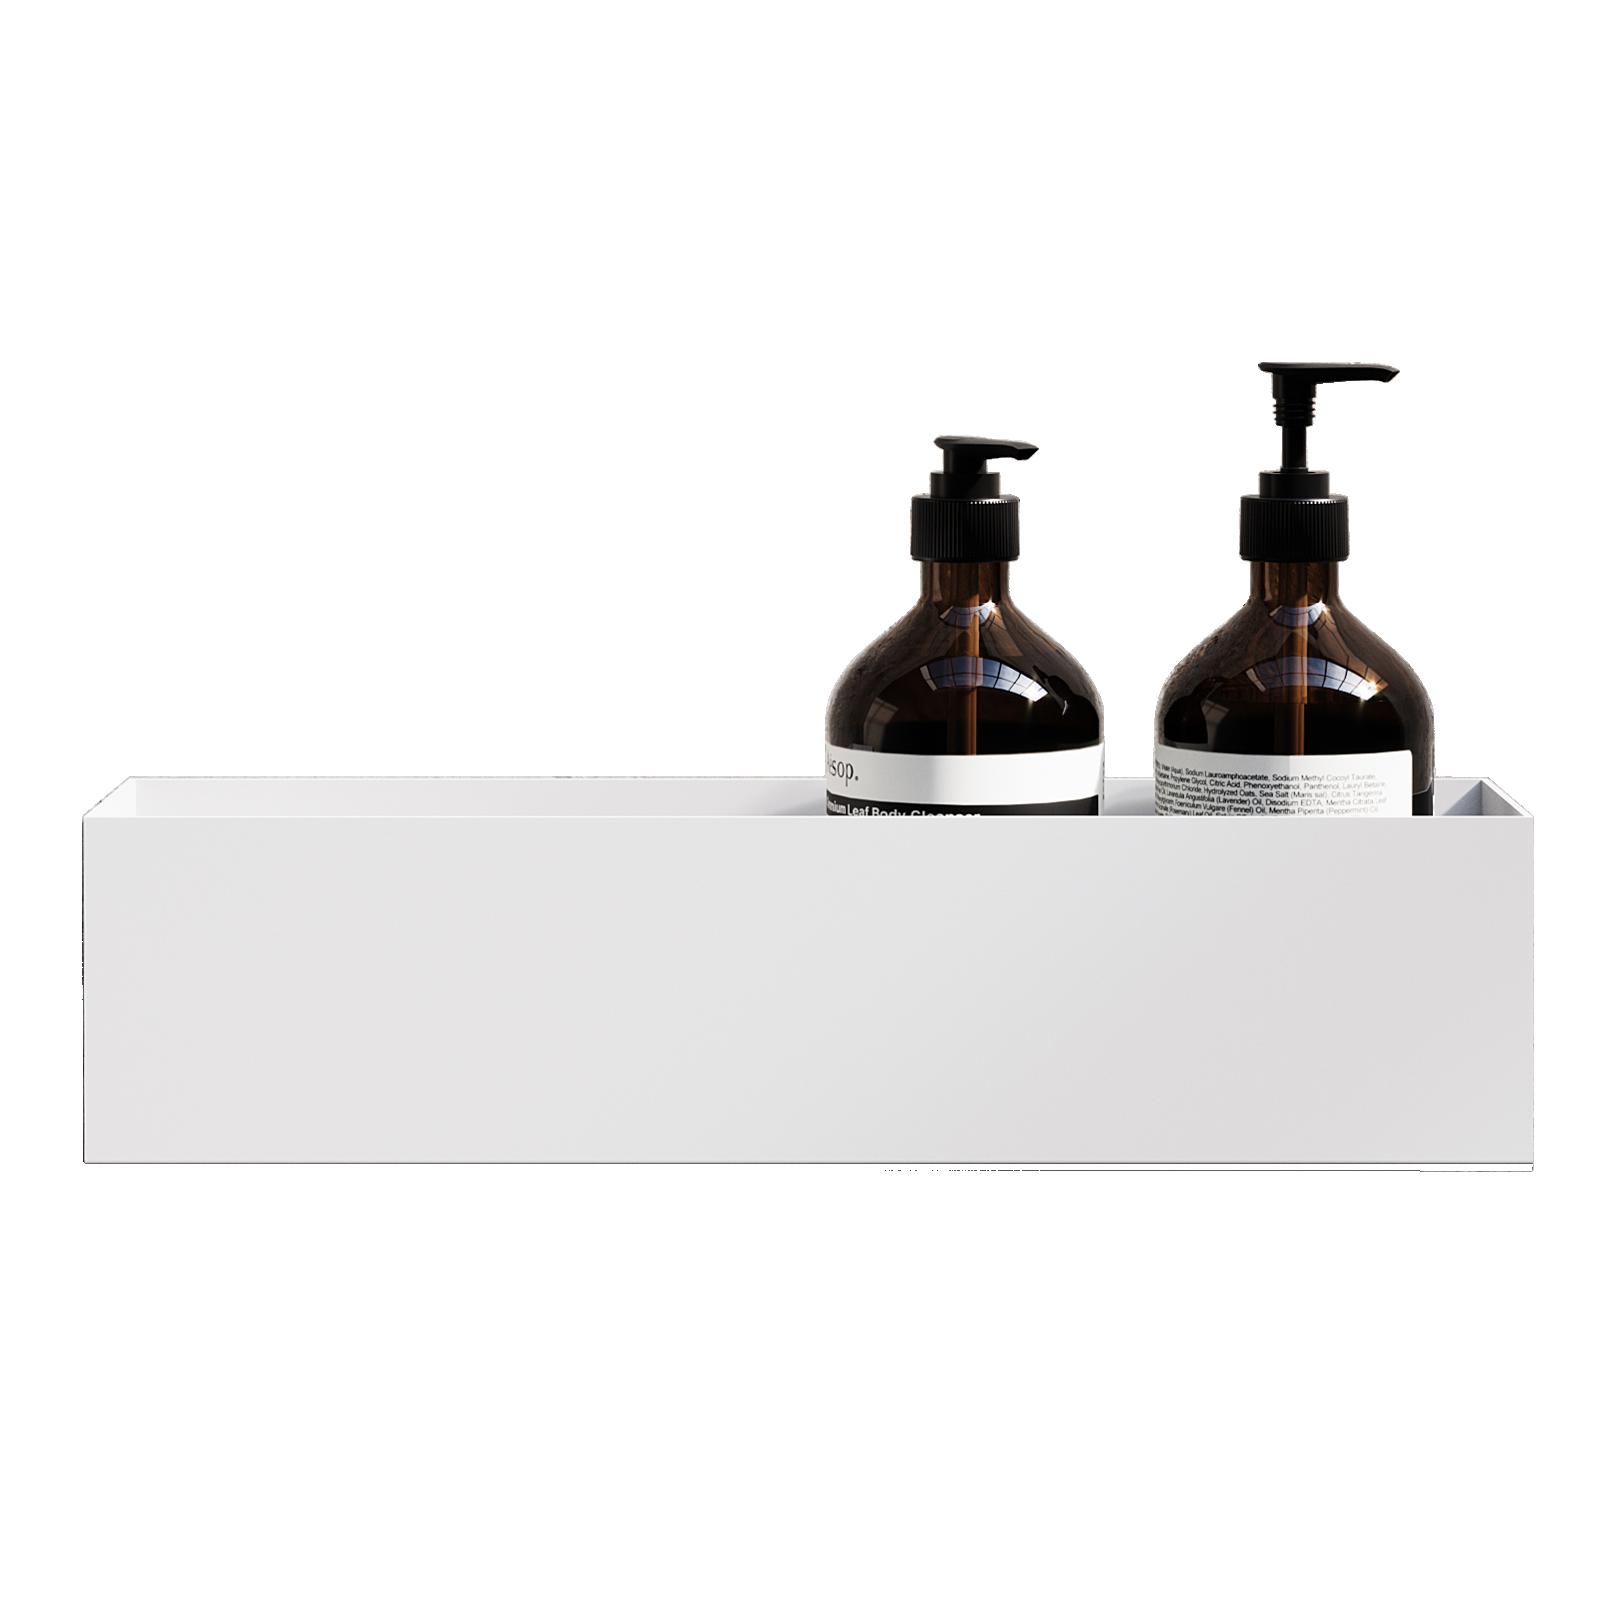 Nichba - Bath Shelf 40 Aufbewahrungsregal - Weiss (L100105W)